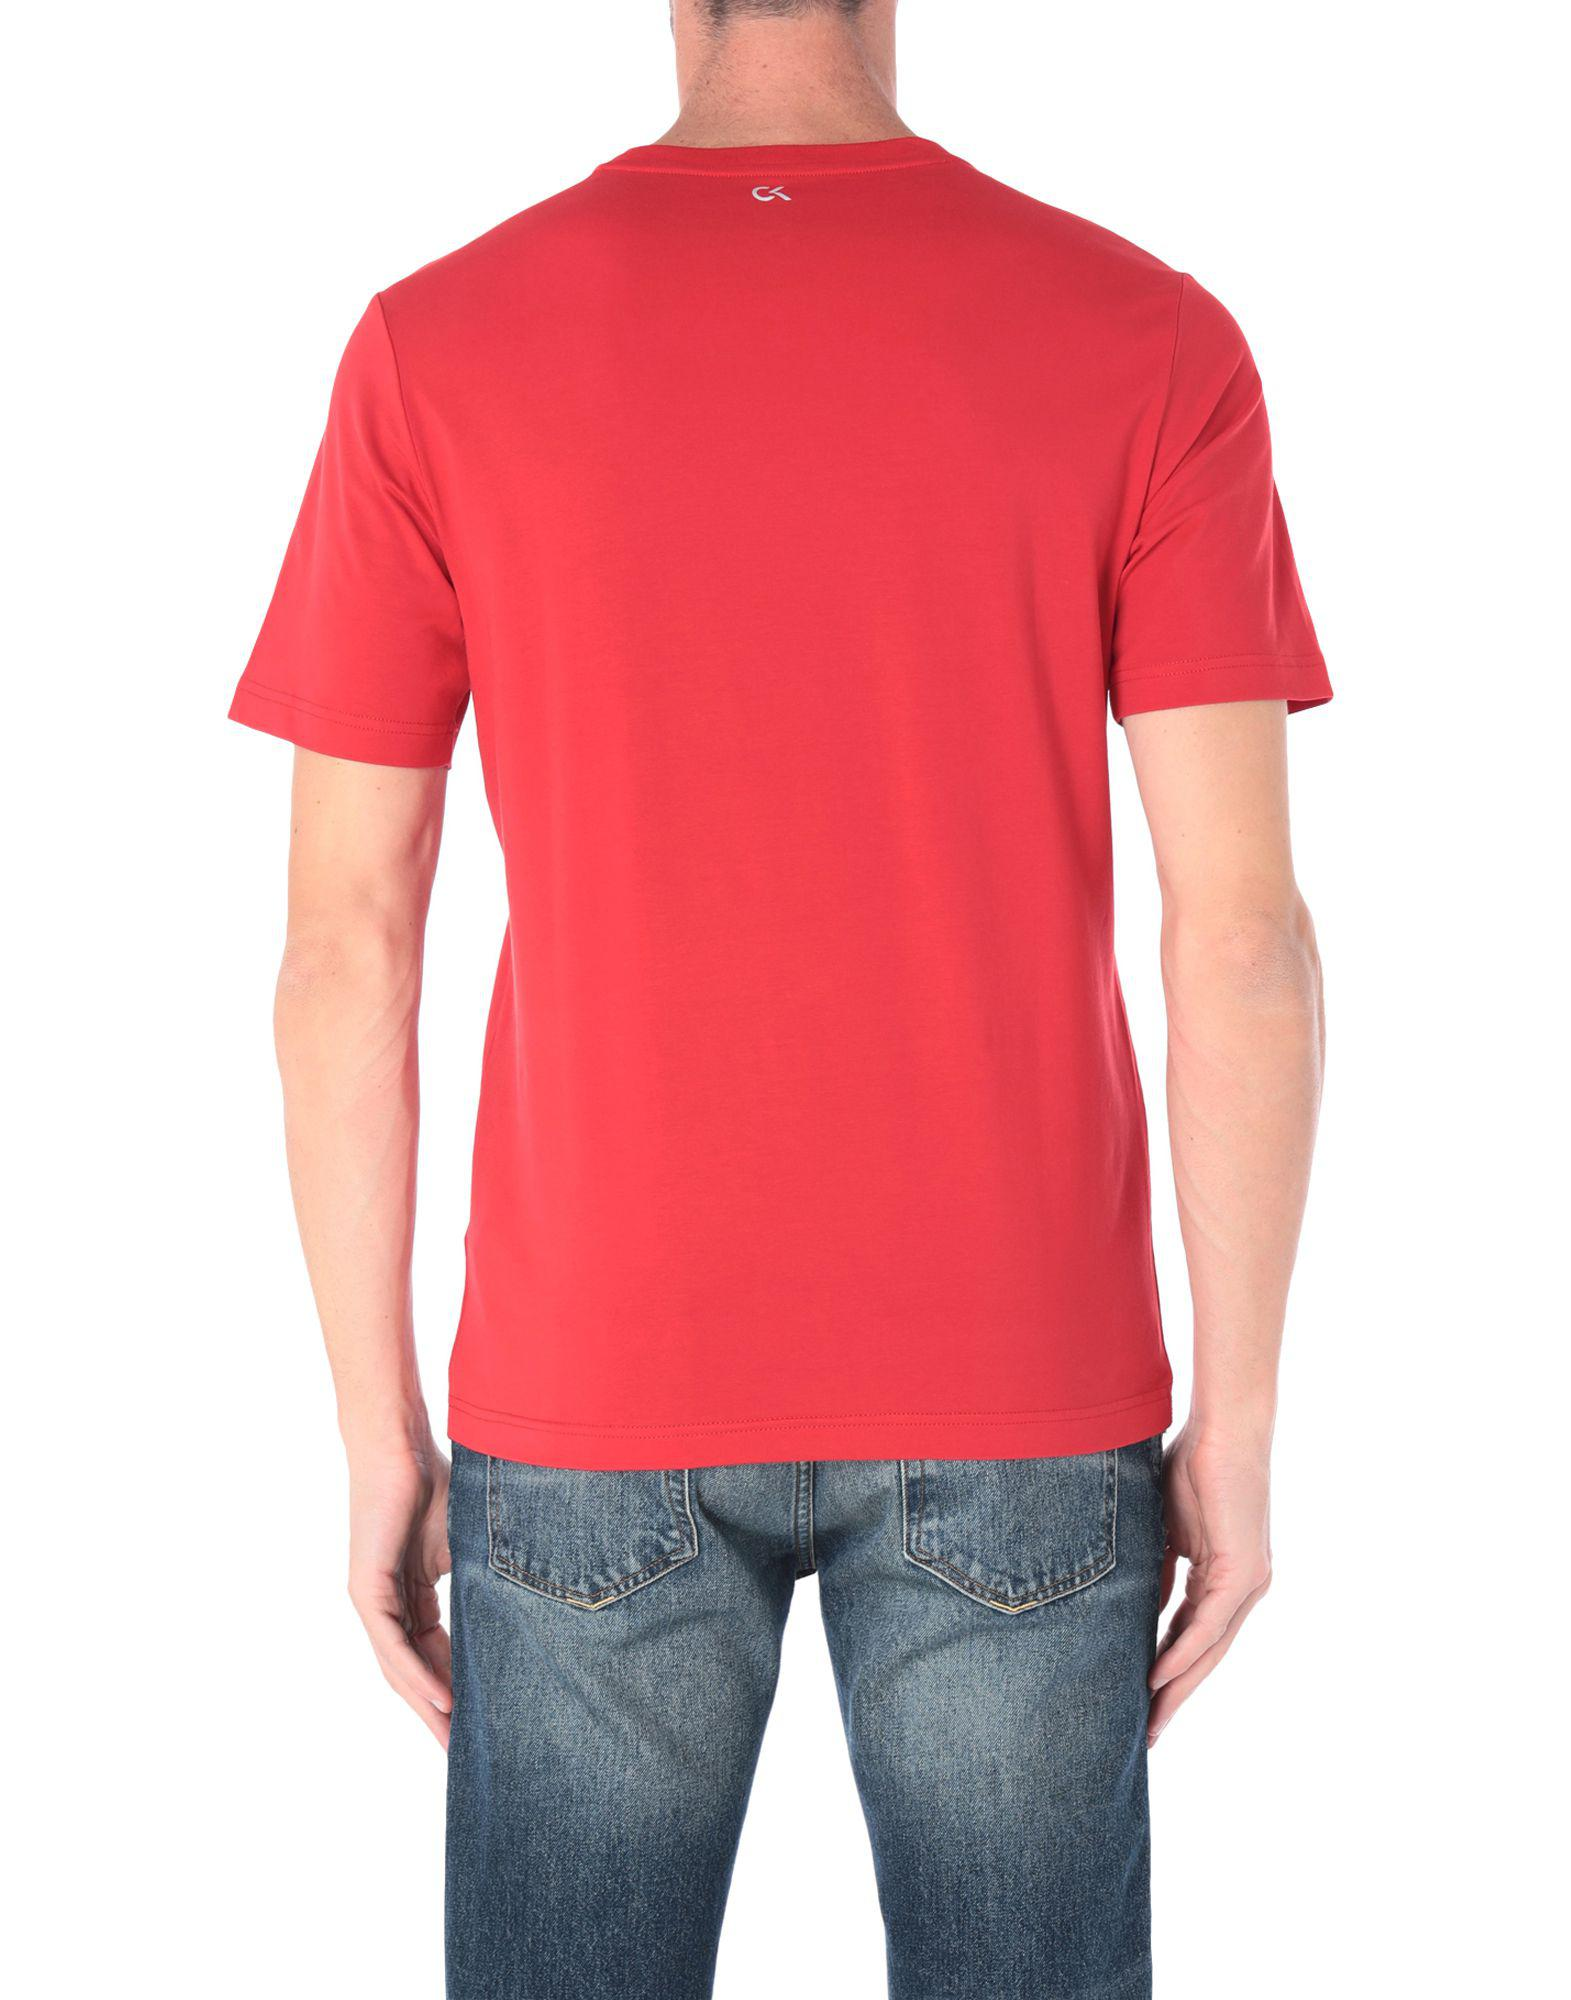 f593b082c80 Lyst - Calvin Klein T-shirt in Red for Men